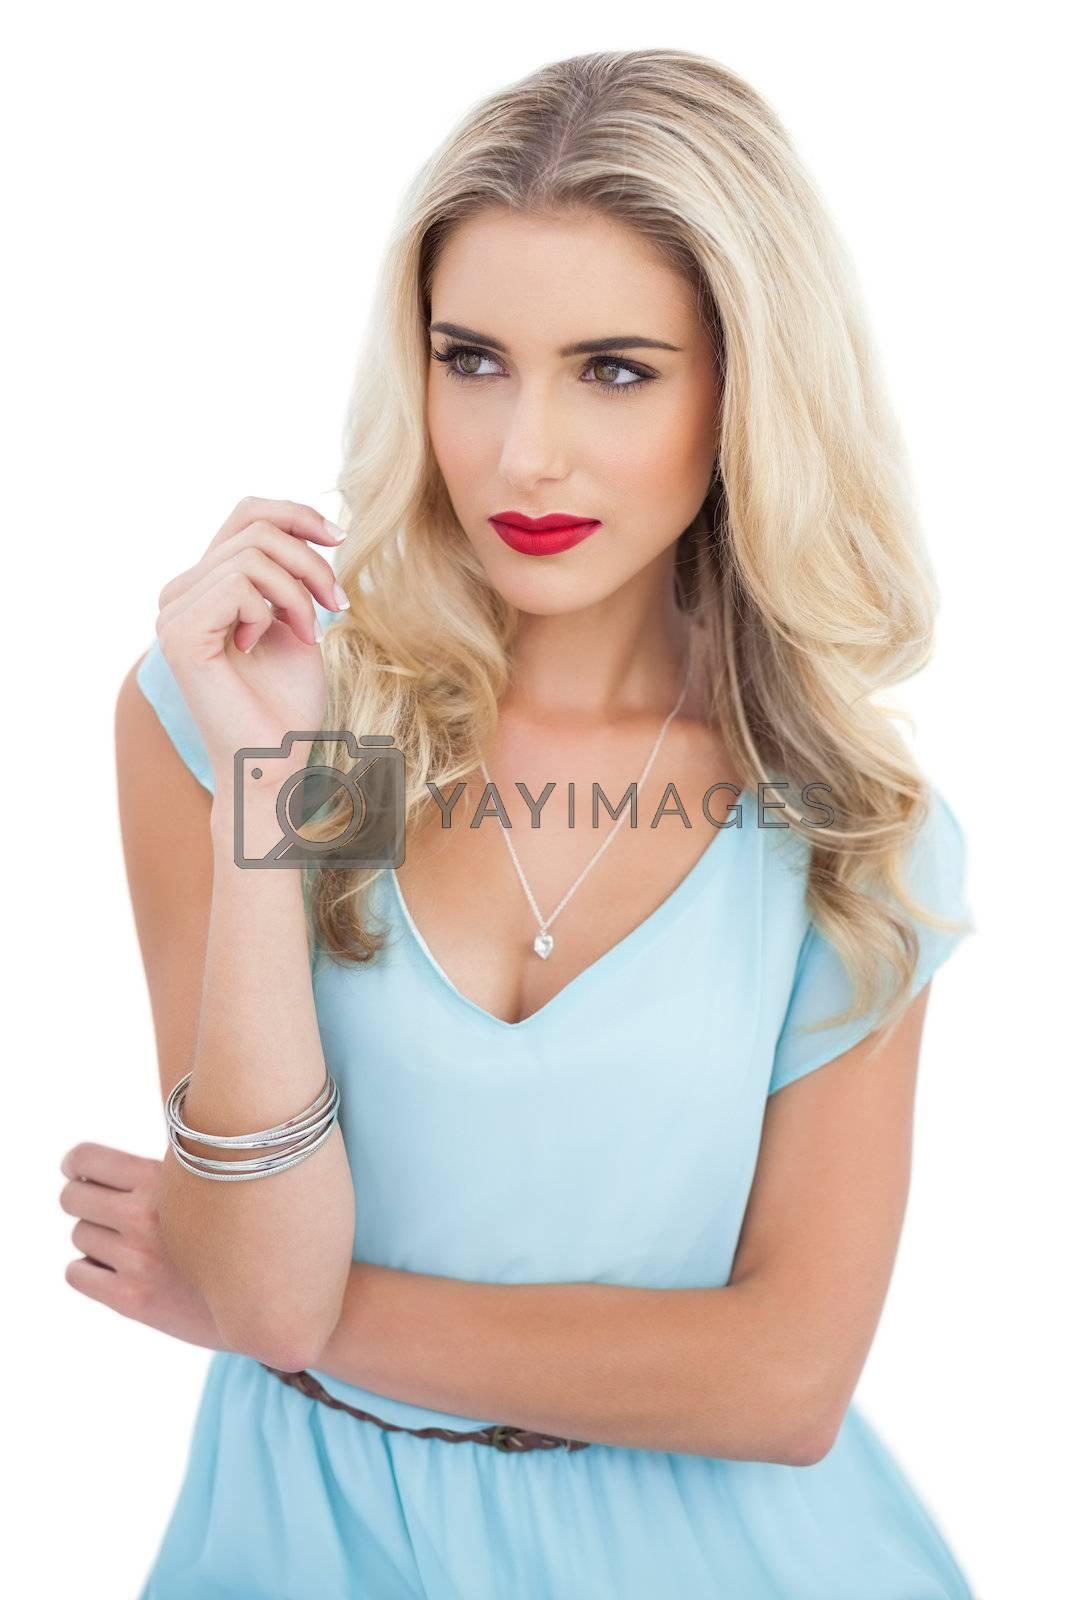 Attractive blonde model in blue dress looking away by Wavebreakmedia